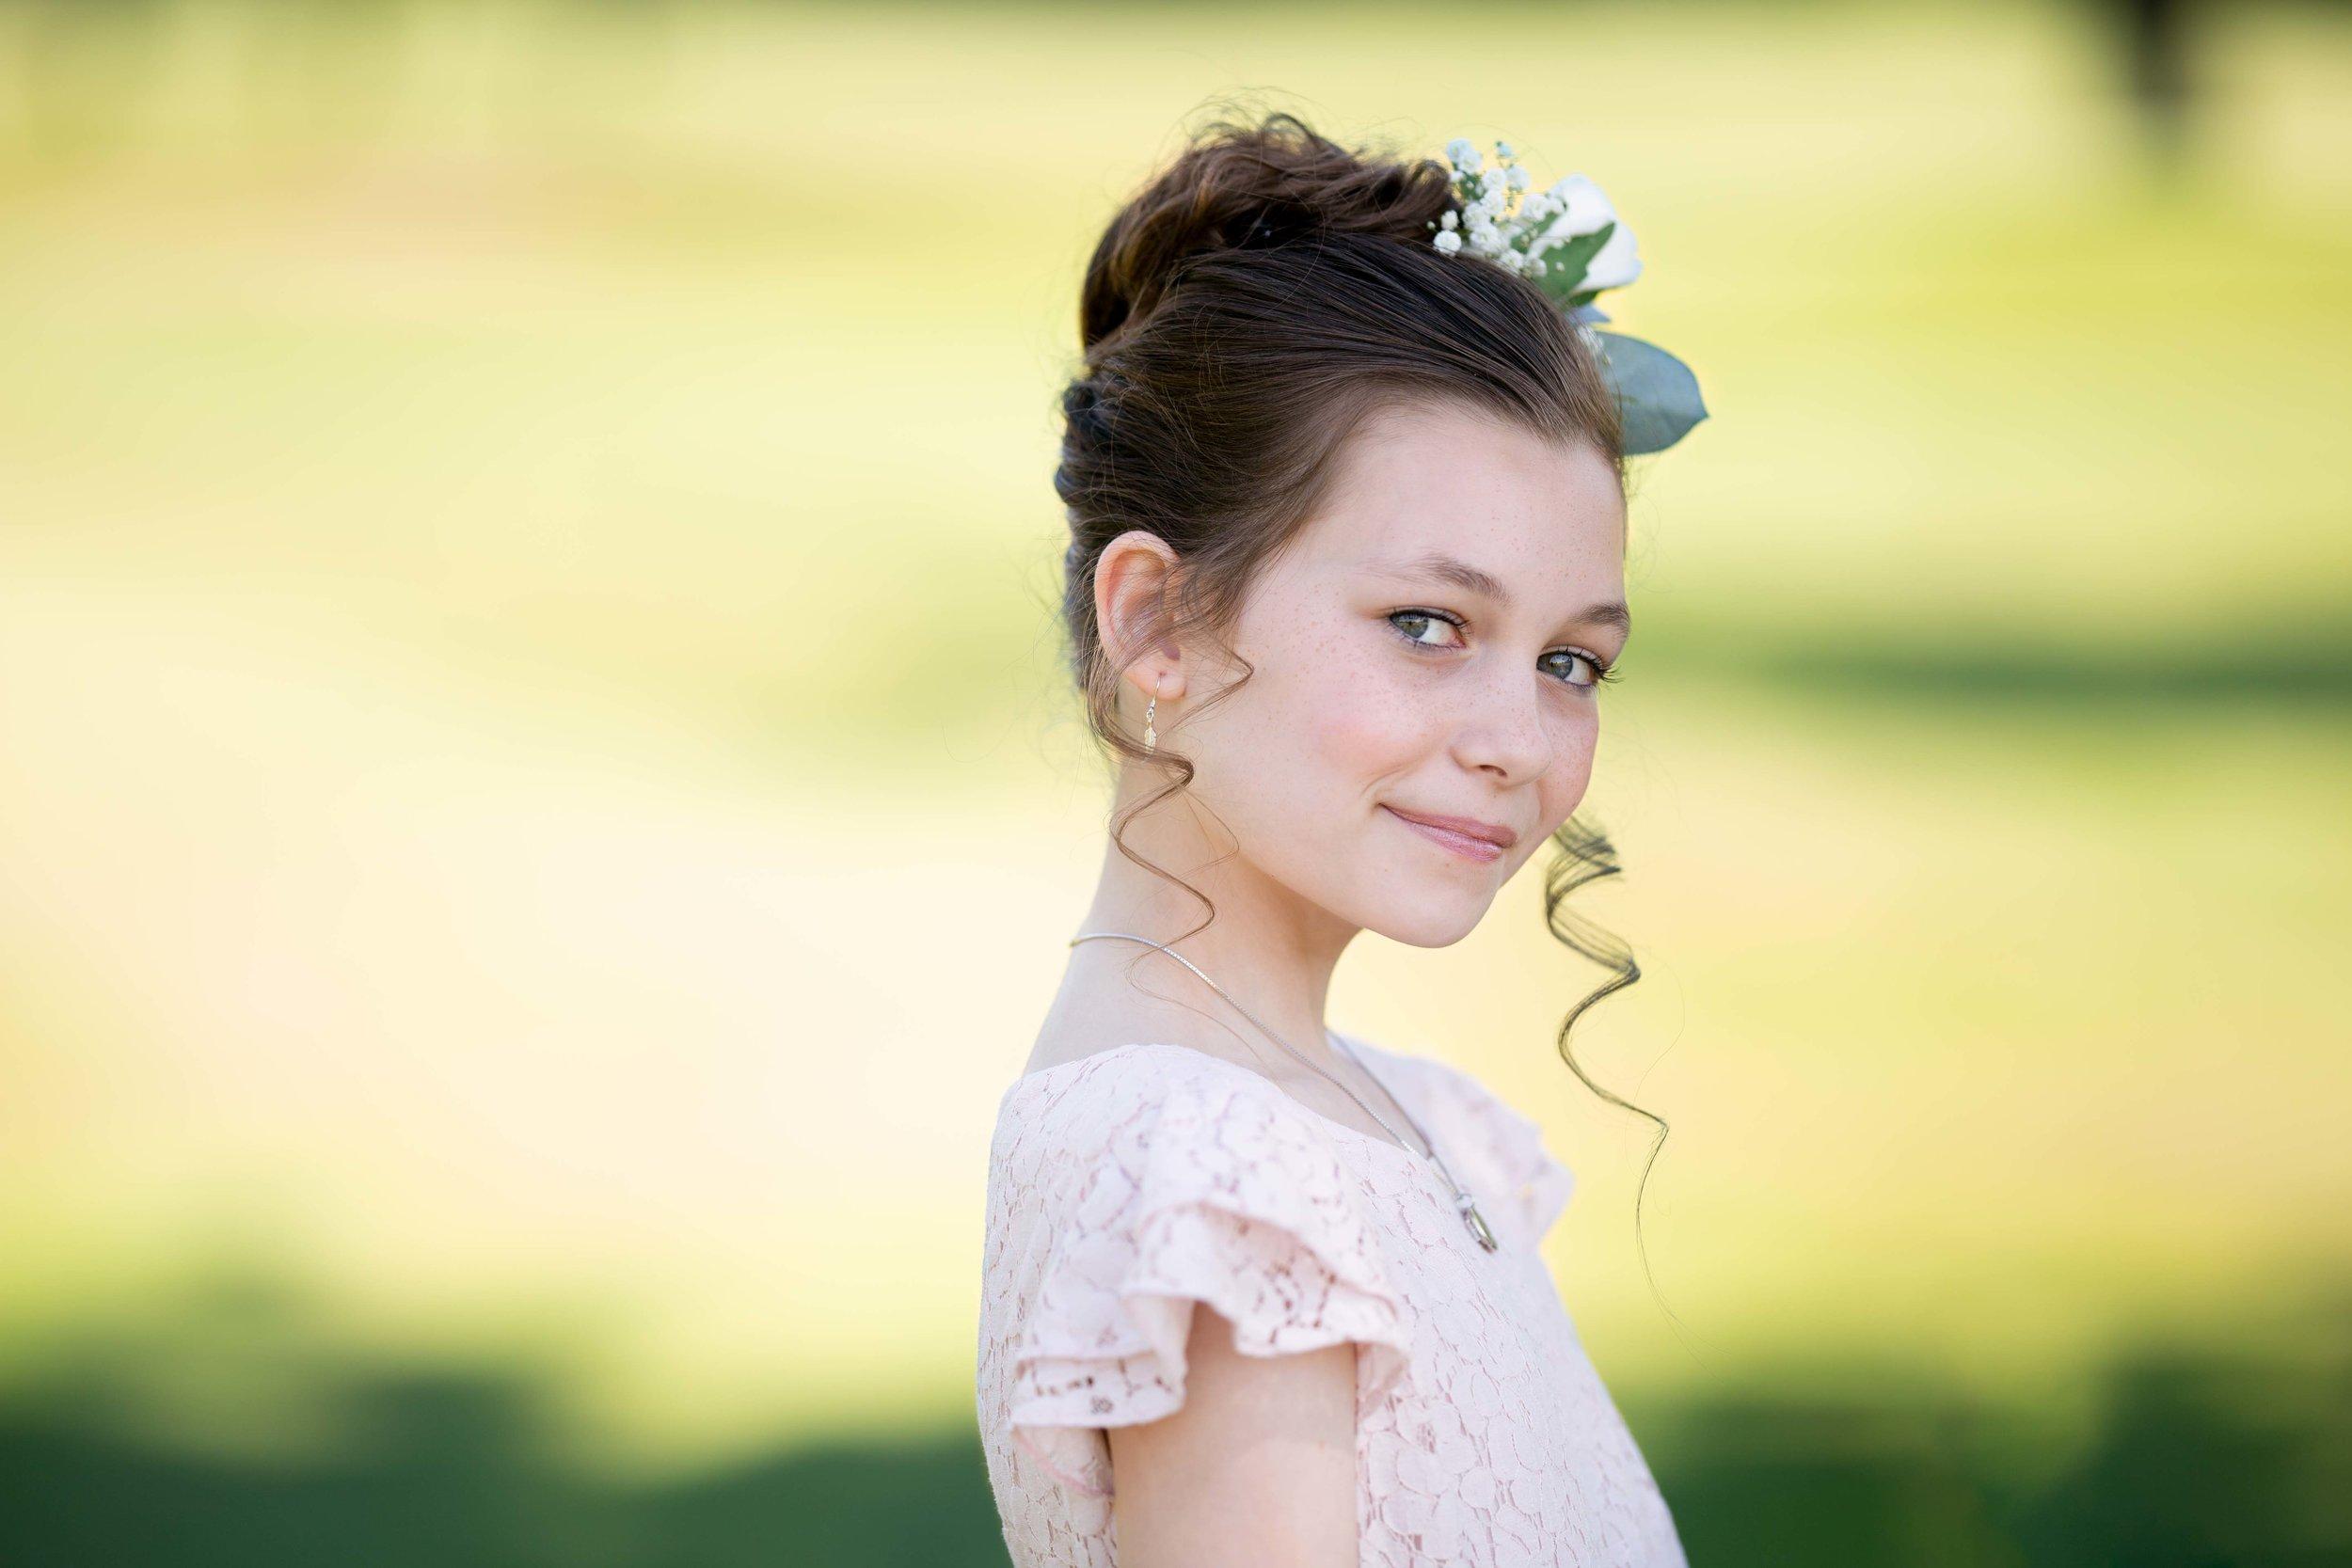 Lea-cooper-photography-wedding-photography-wolverhampton-patshull-park-hotel-wedding-pattingham-wolverhampton-west-midlands-uk-20.JPG